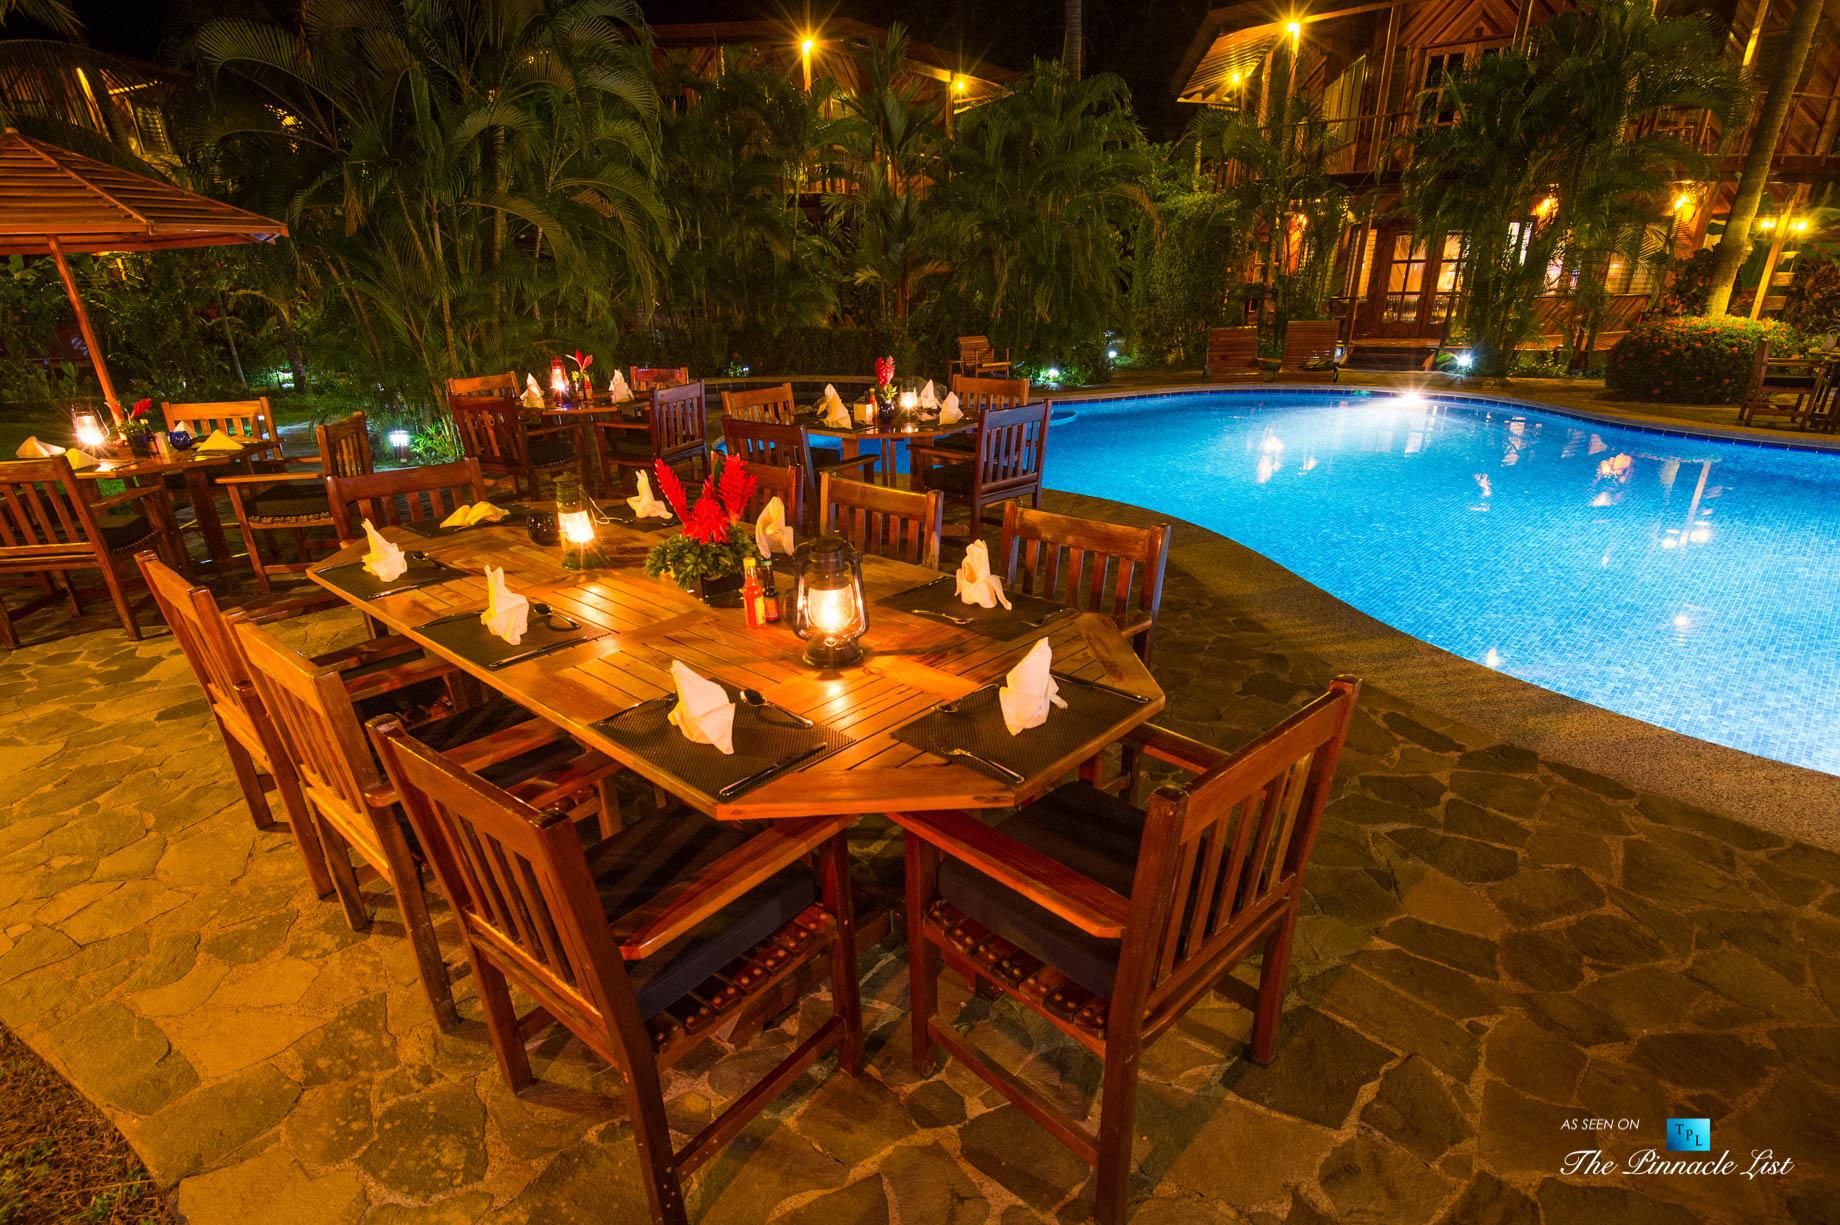 Tambor Tropical Beach Resort – Tambor, Puntarenas, Costa Rica – Poolside Restaurant at Night